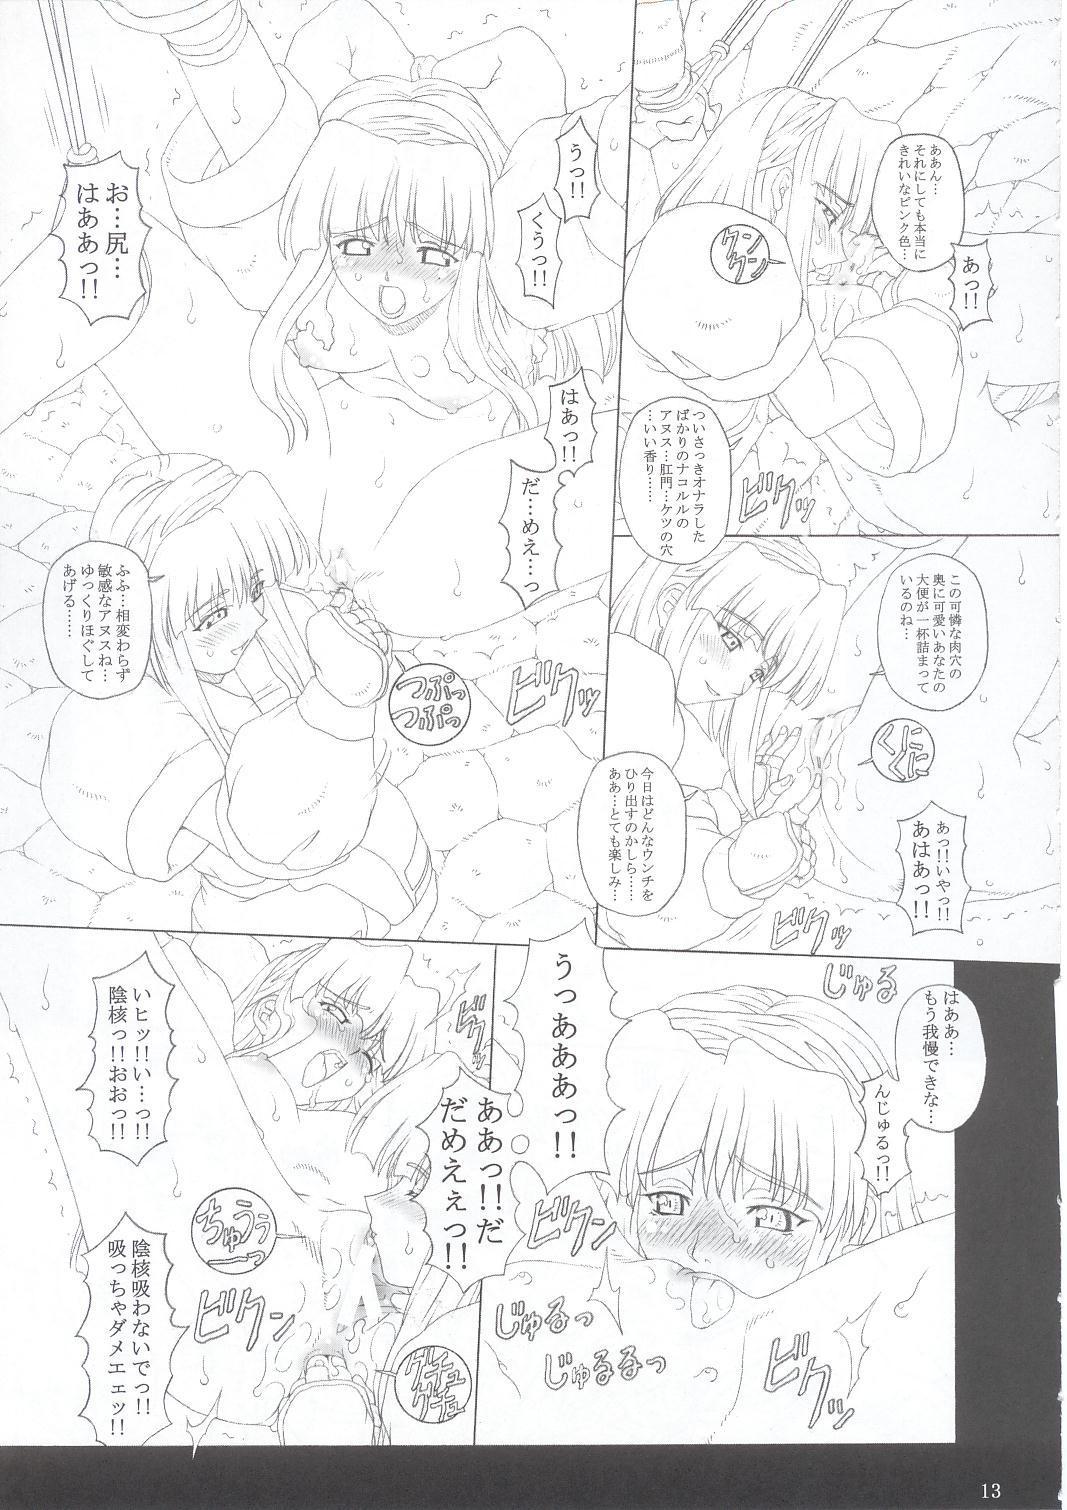 JUNK Dain no Miko San 11